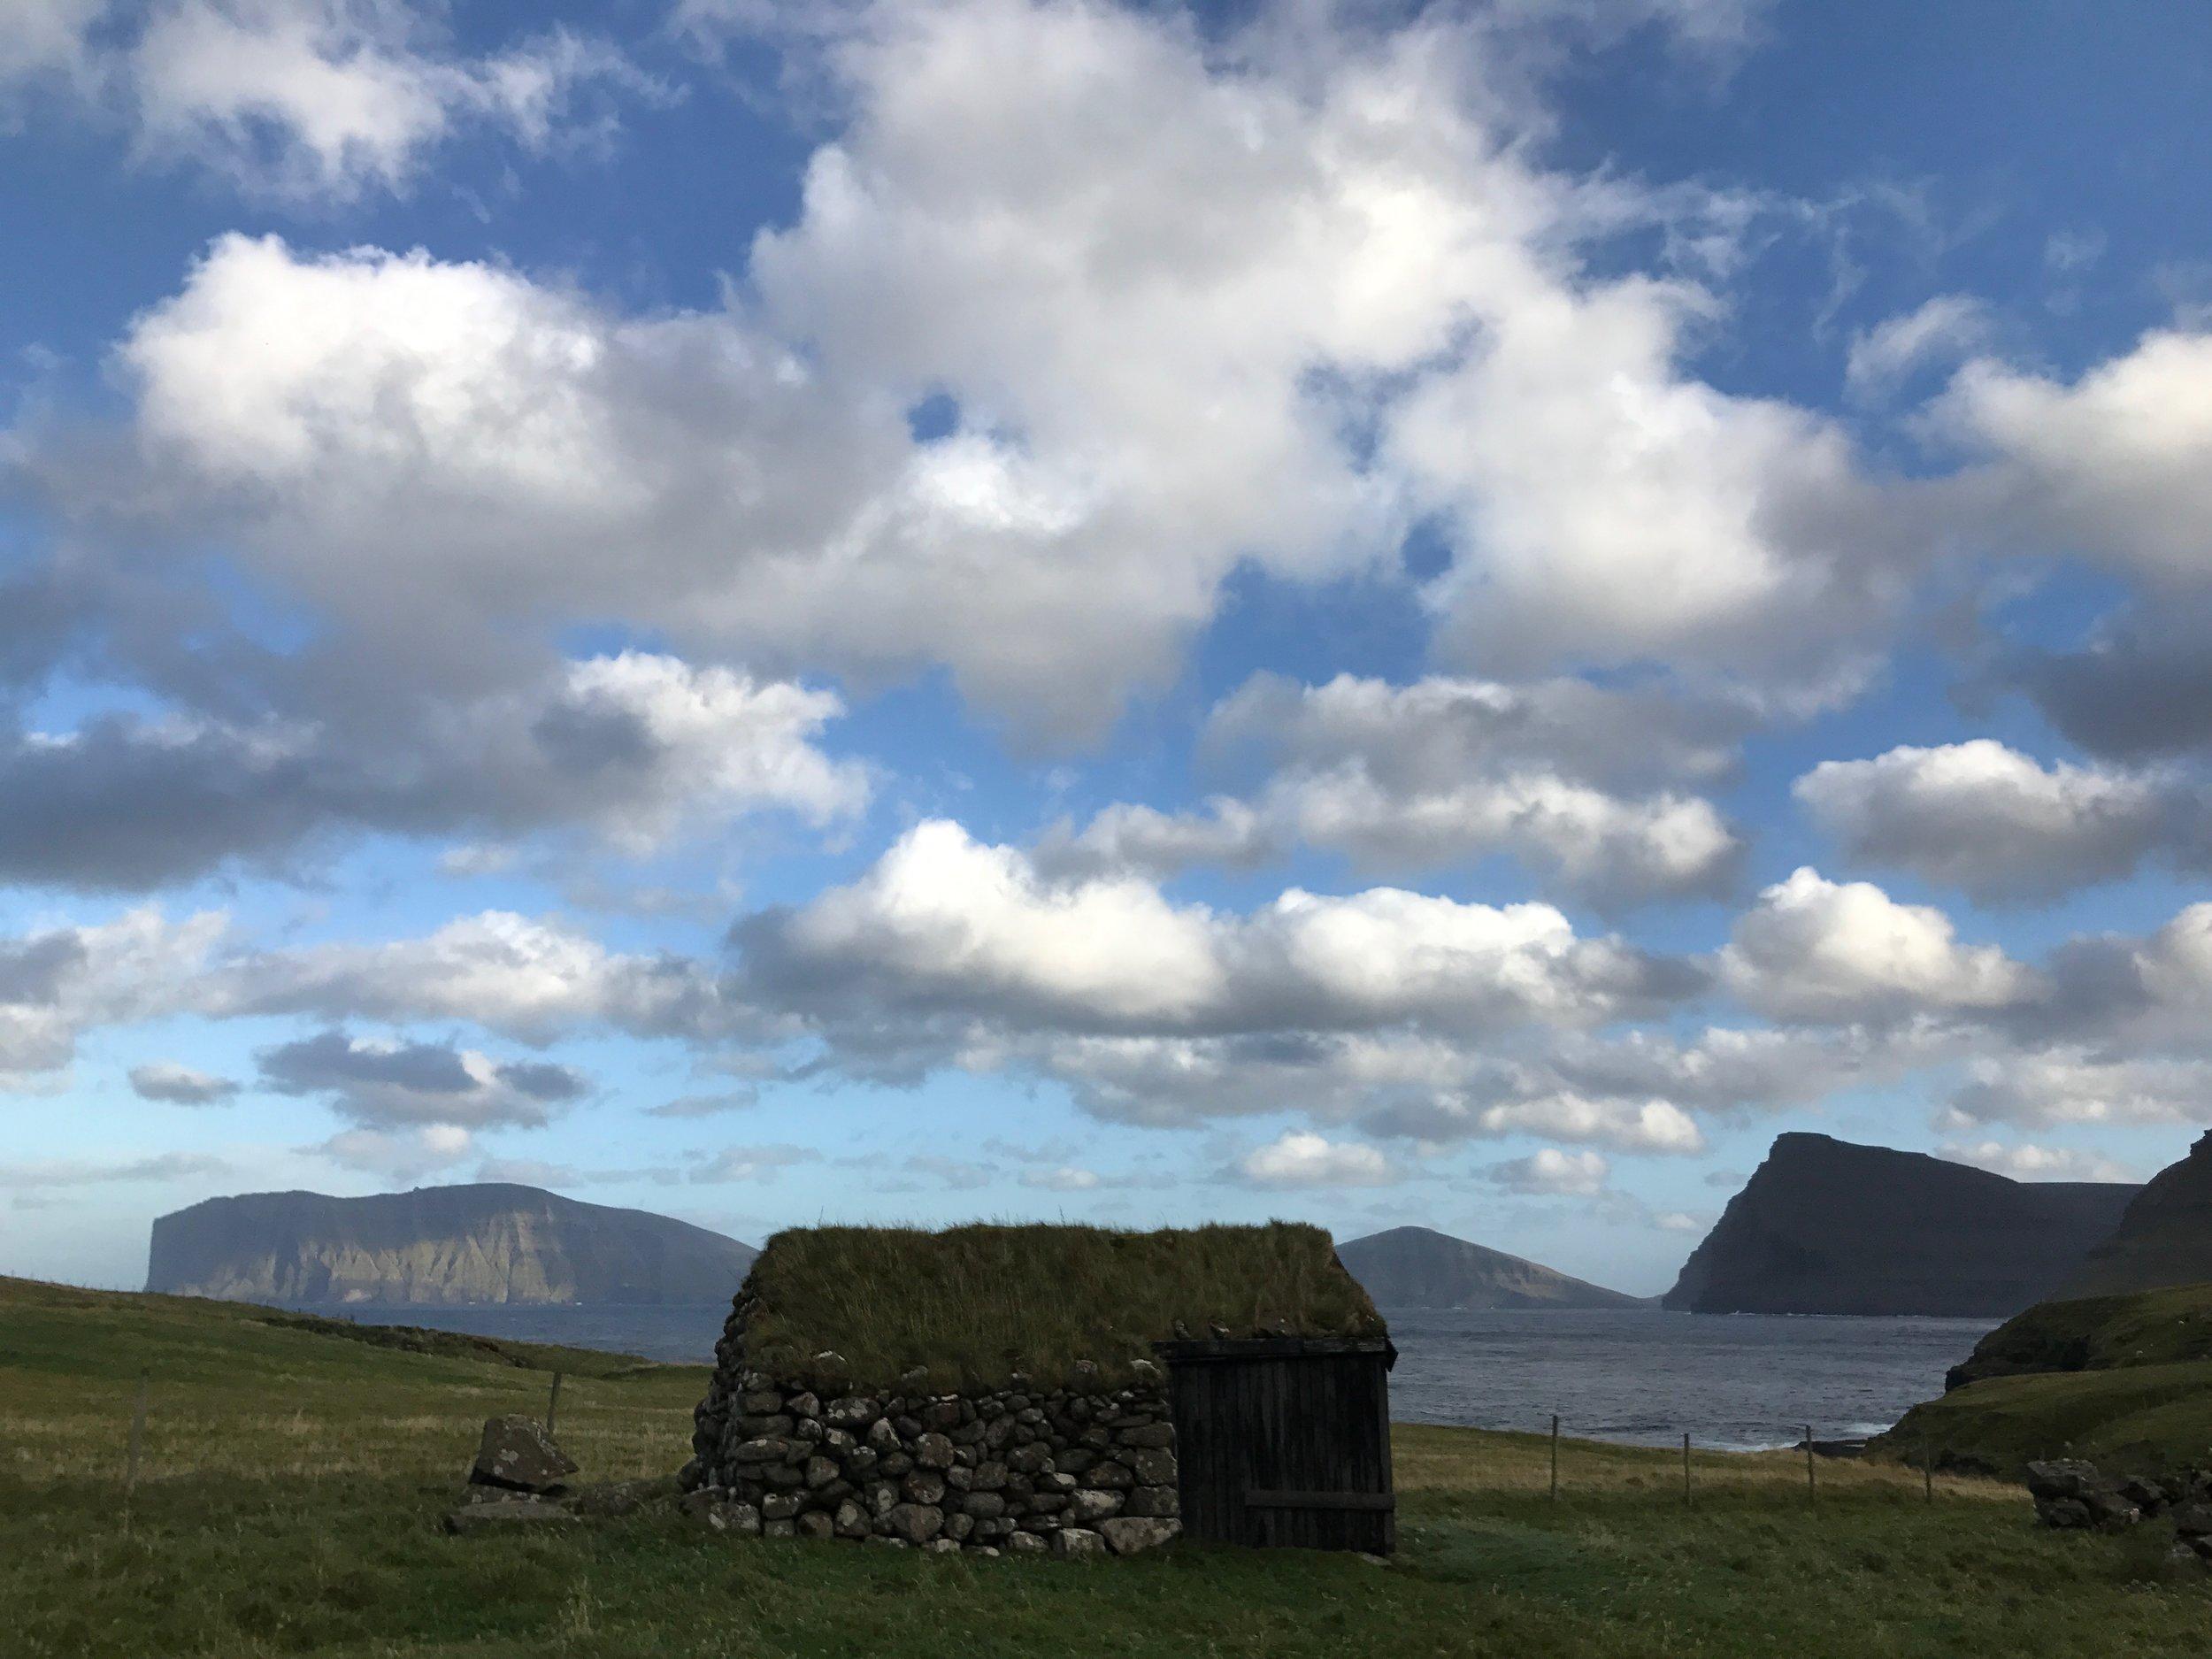 Classice Faroese architecture. Faroe Islands - September 2017